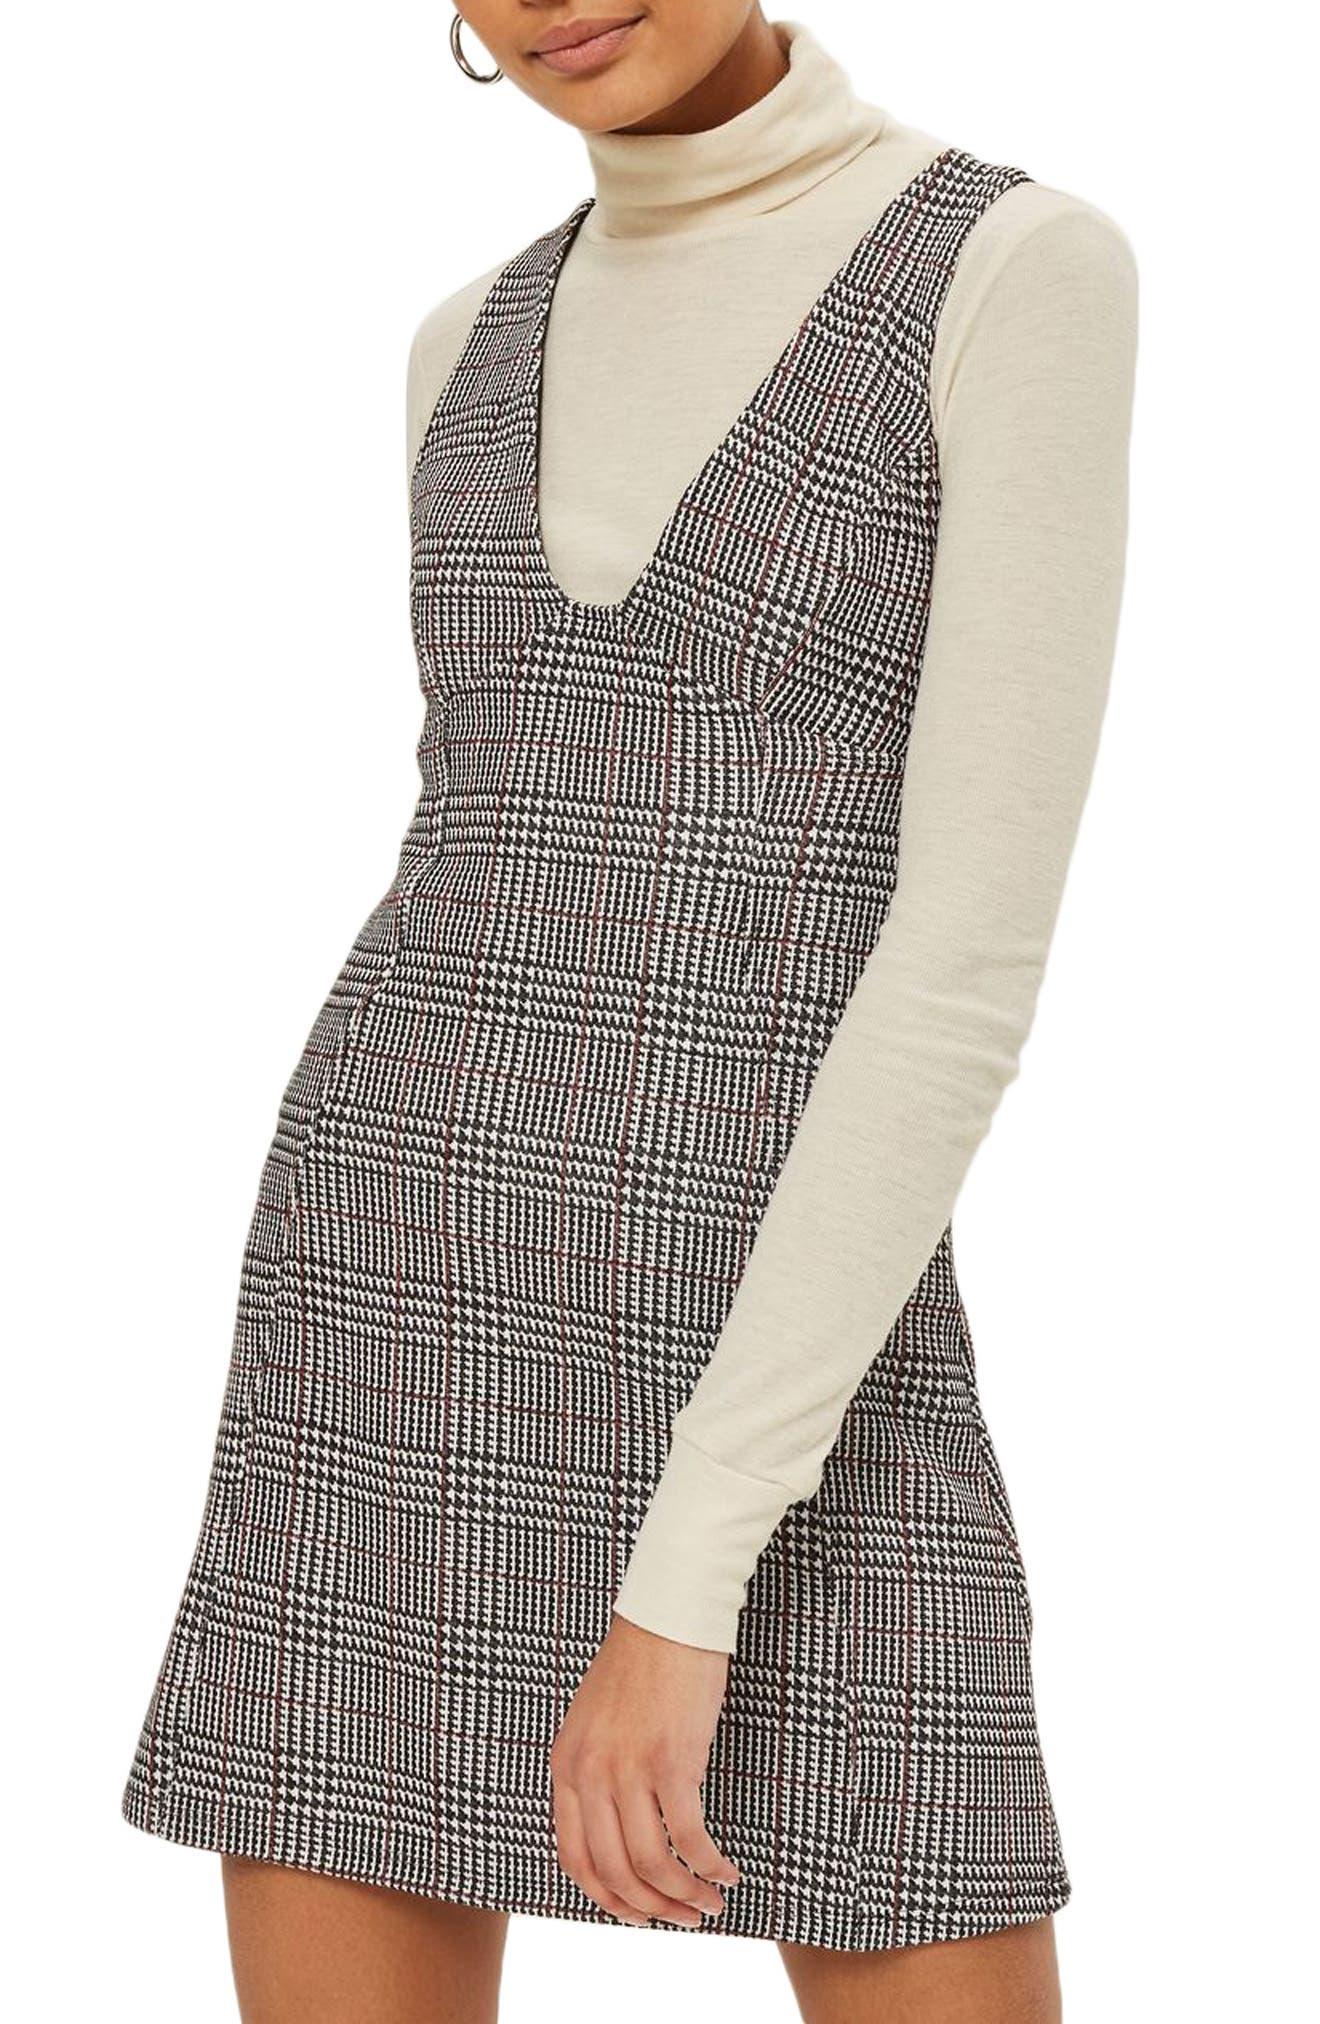 Topshop Plaid A-Line Pinafore Dress